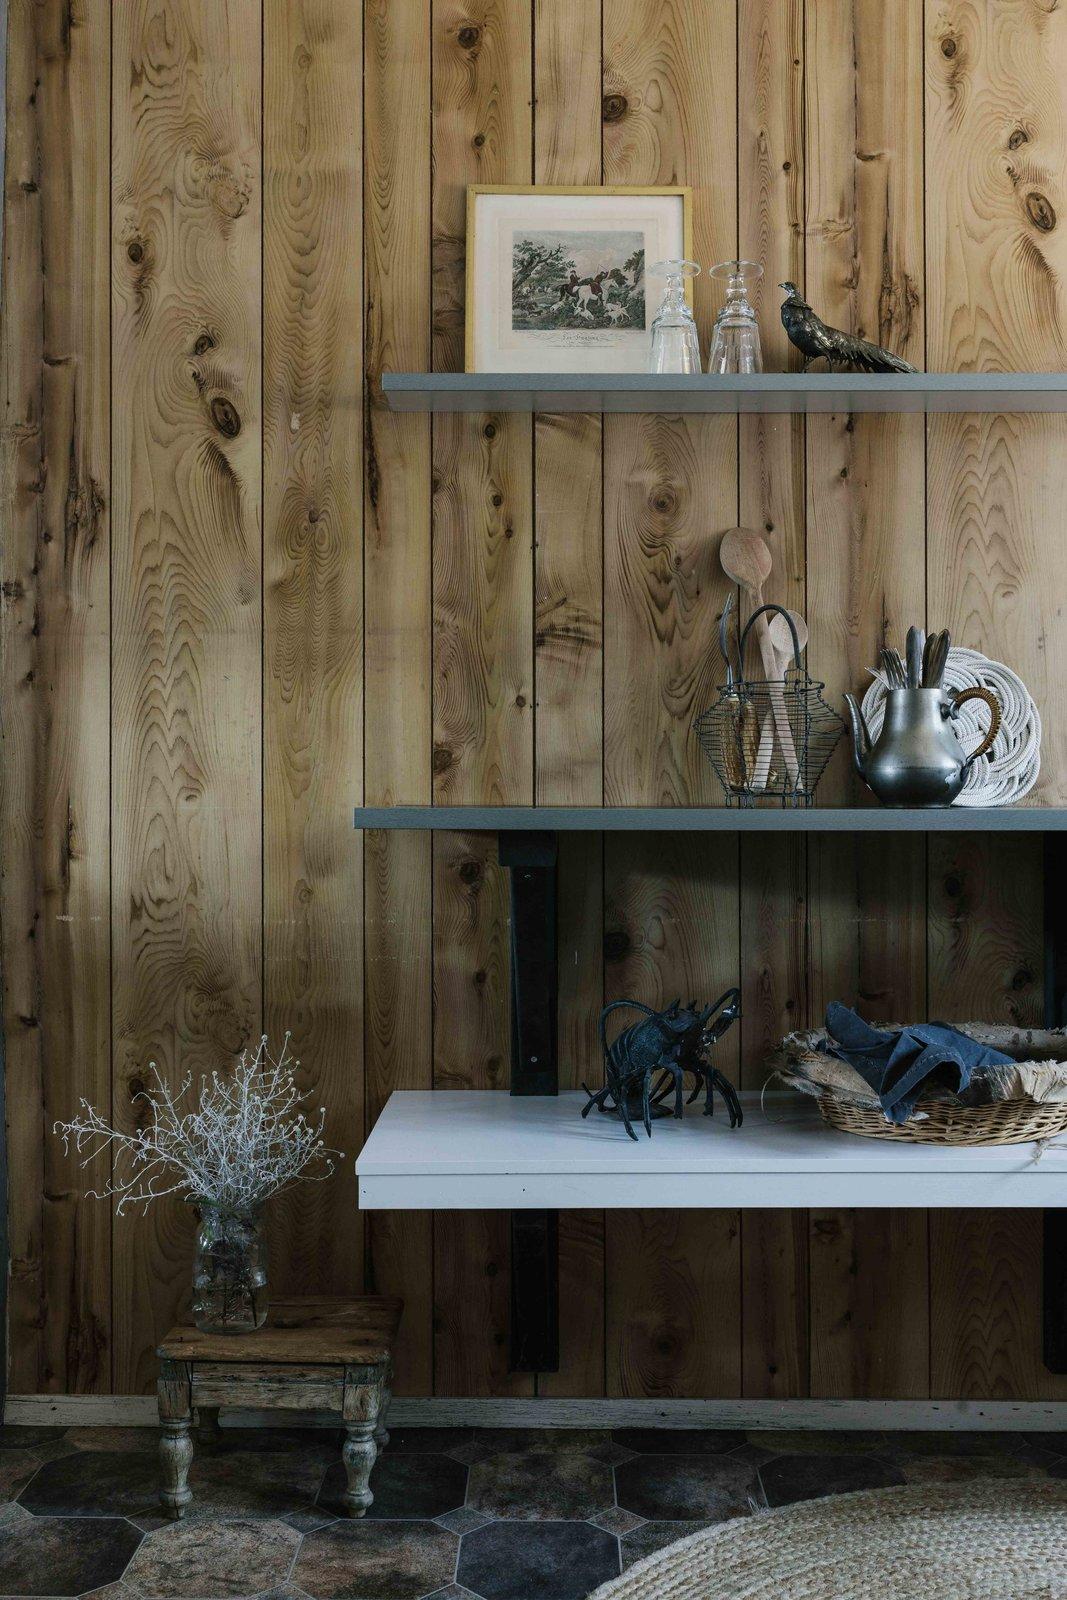 Living Room, Shelves, Porcelain Tile Floor, and Rug Floor  Photo 10 of 13 in A Cluster of A-Frames Hugs White Sand Dunes on Australia's Southwestern Coast